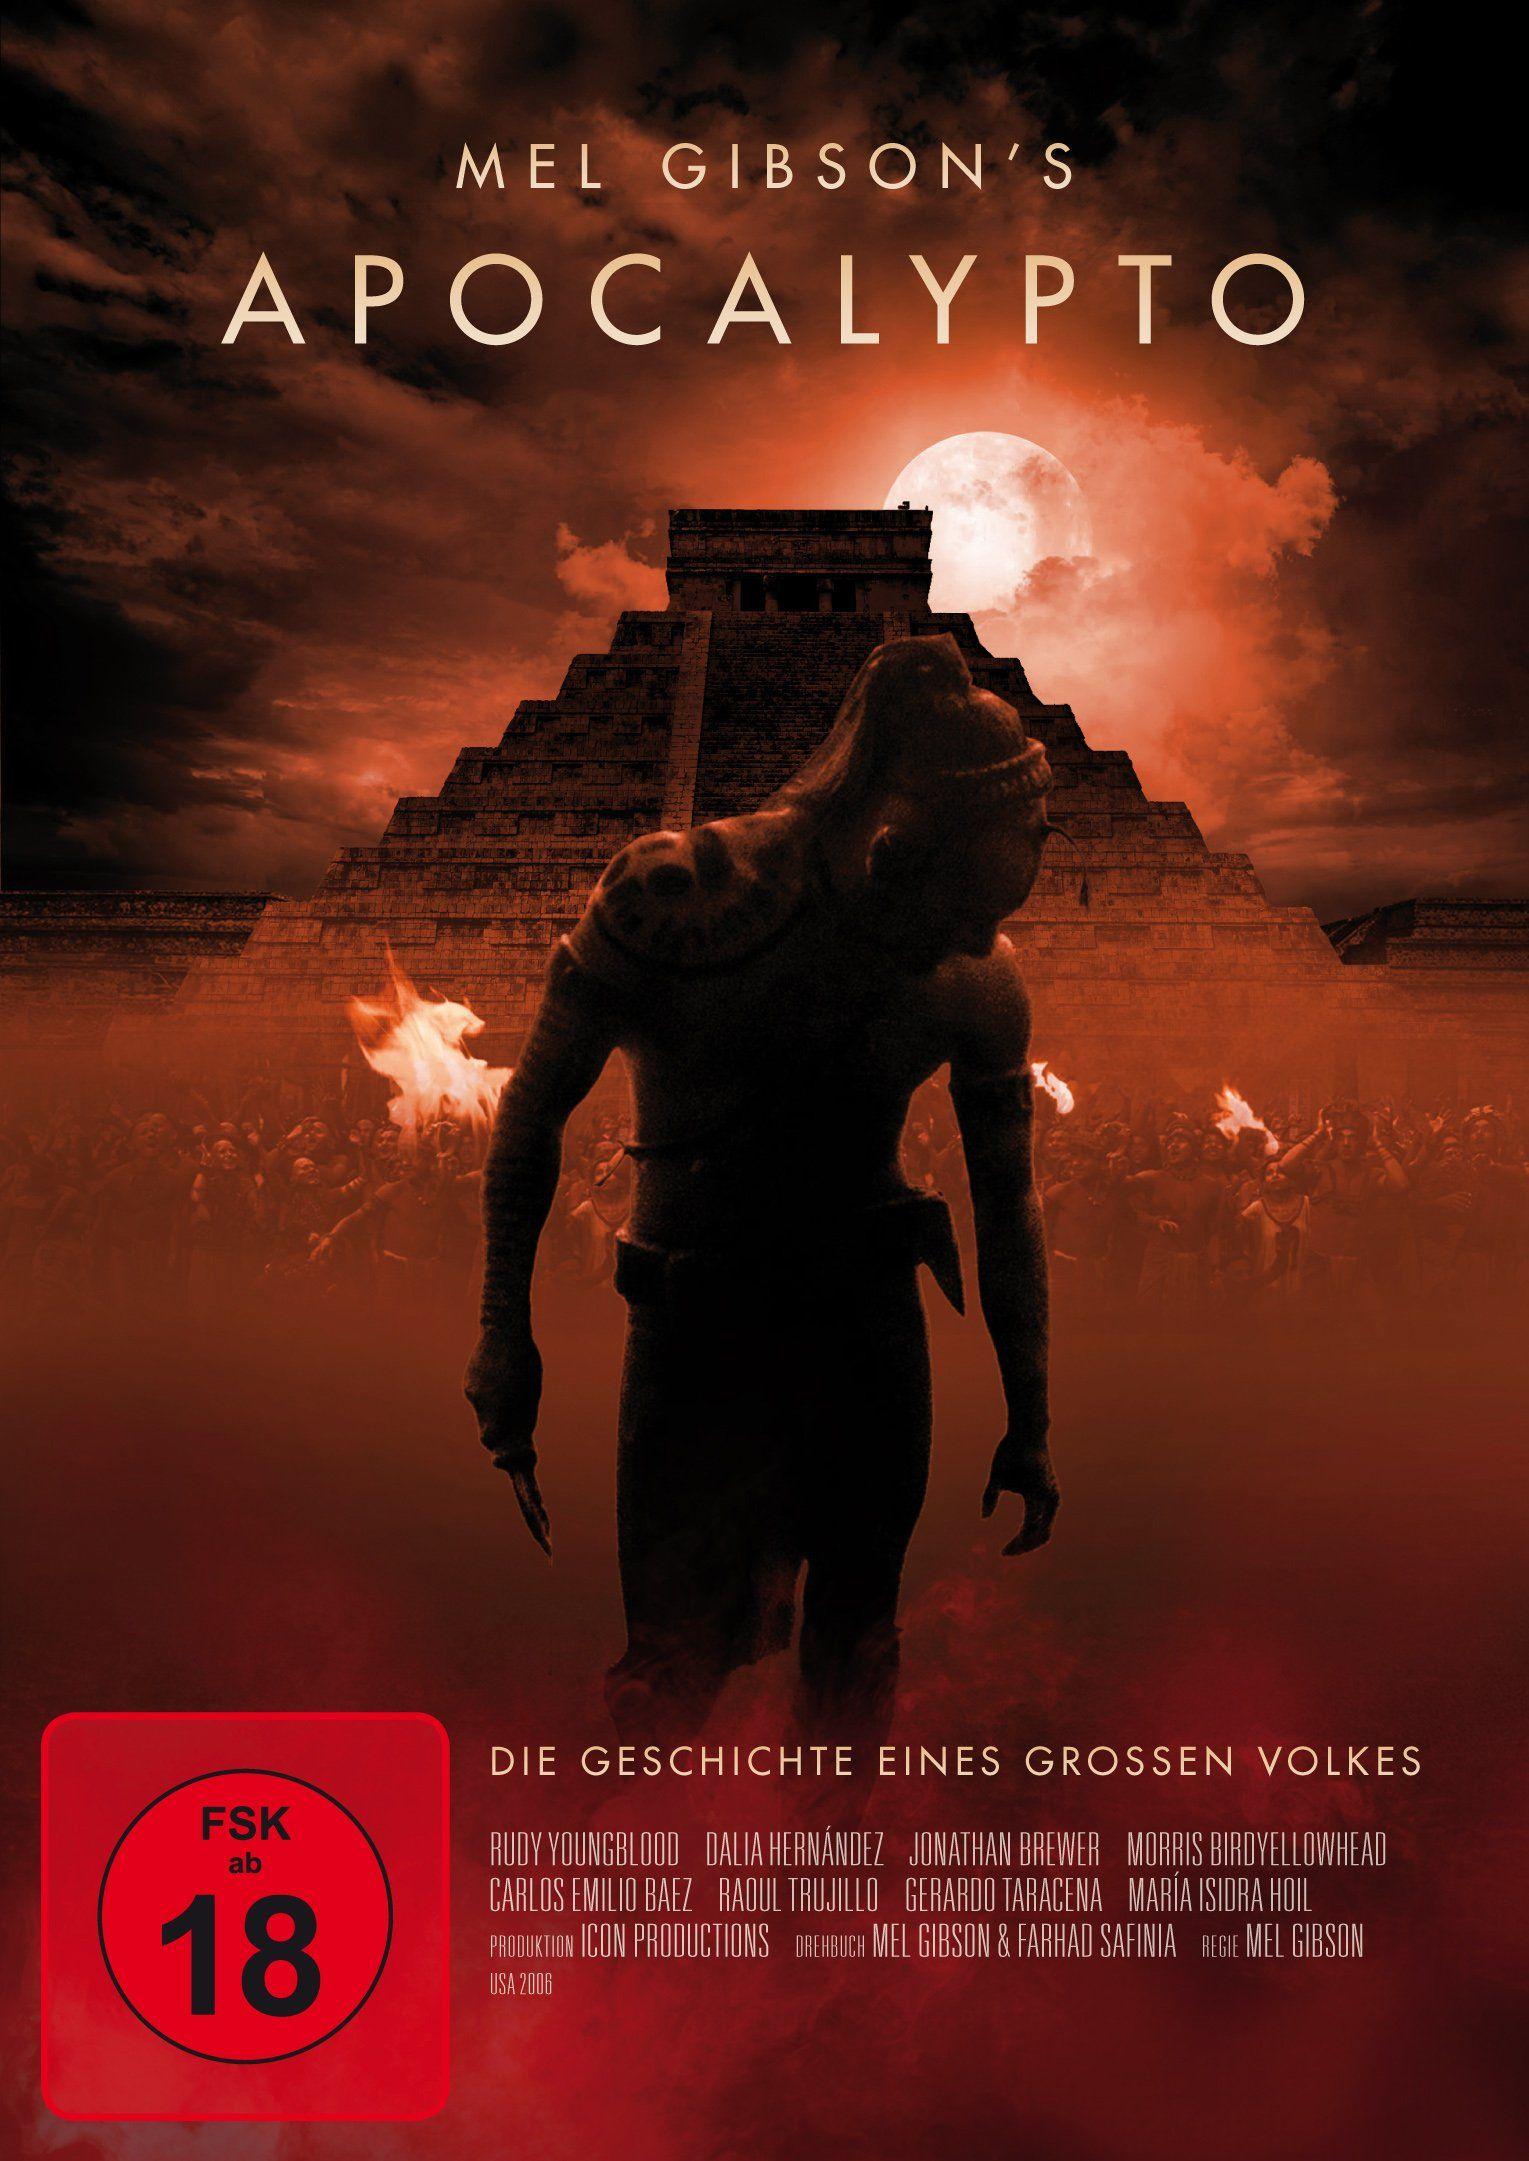 Apocalypto Omu Apocalypto Omu Ad Movies Online Full Movies Full Movies Online